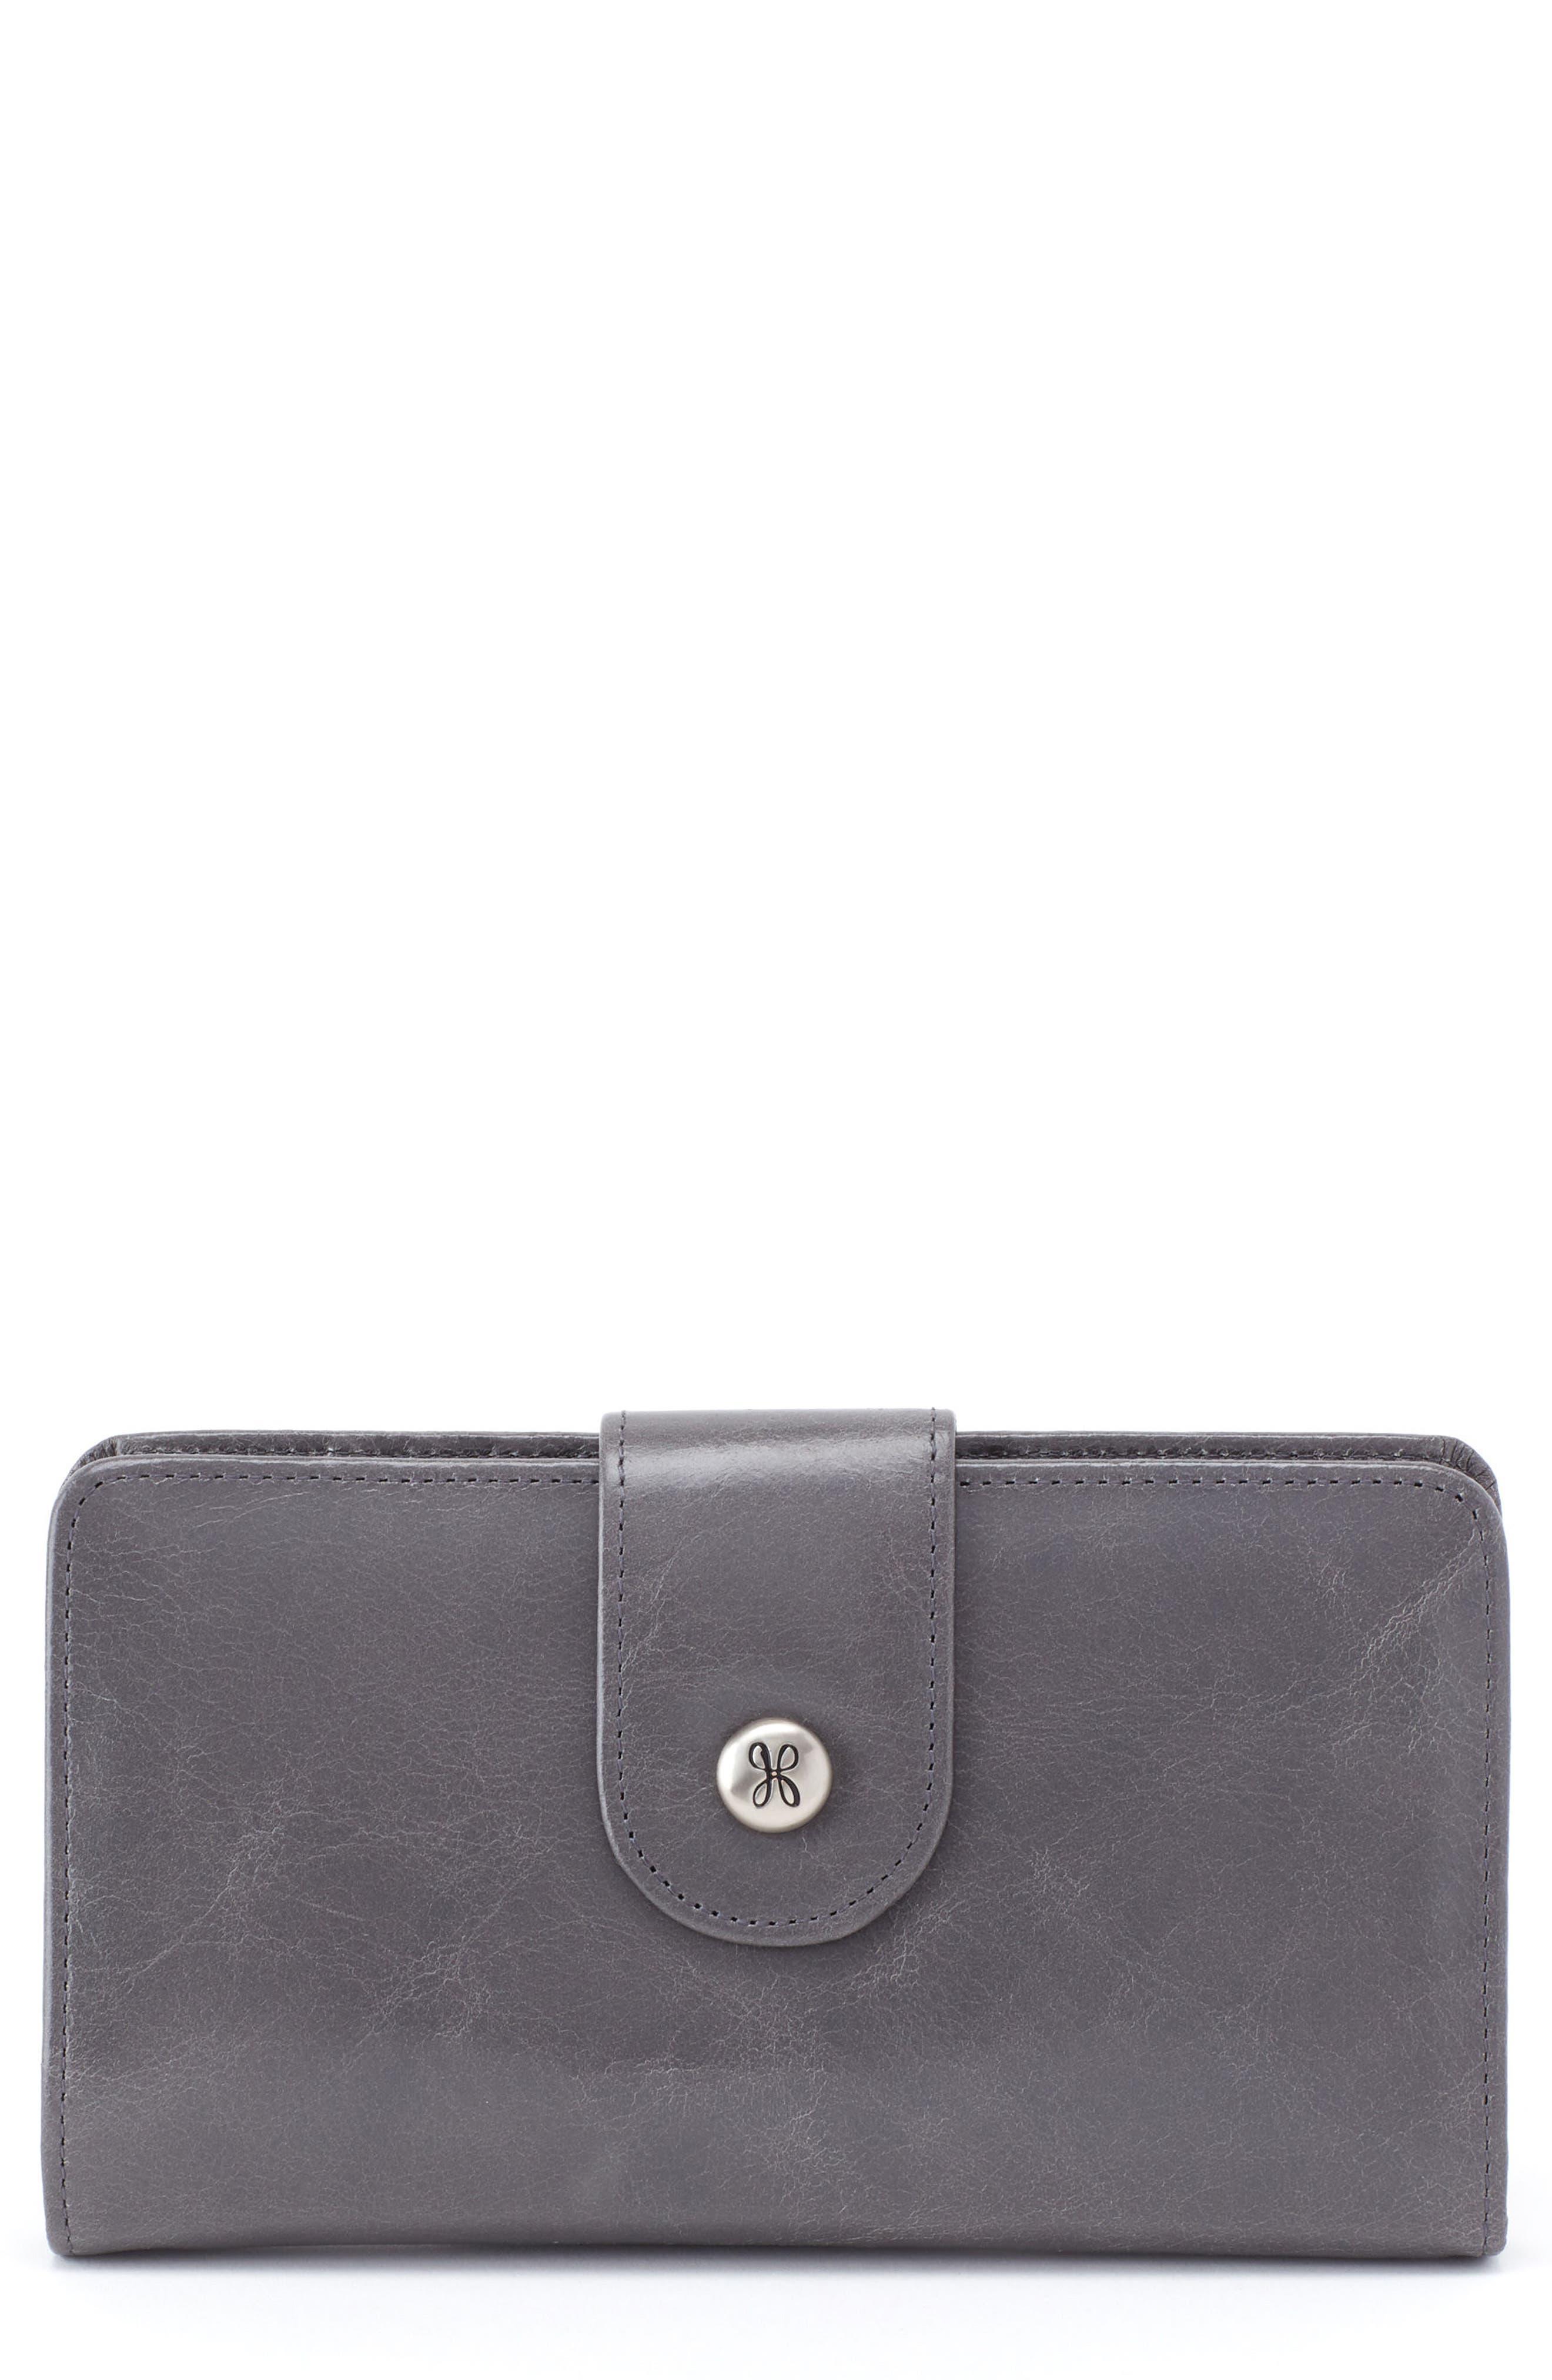 'Danette' Glazed Leather Continental Wallet,                             Main thumbnail 1, color,                             Graphite